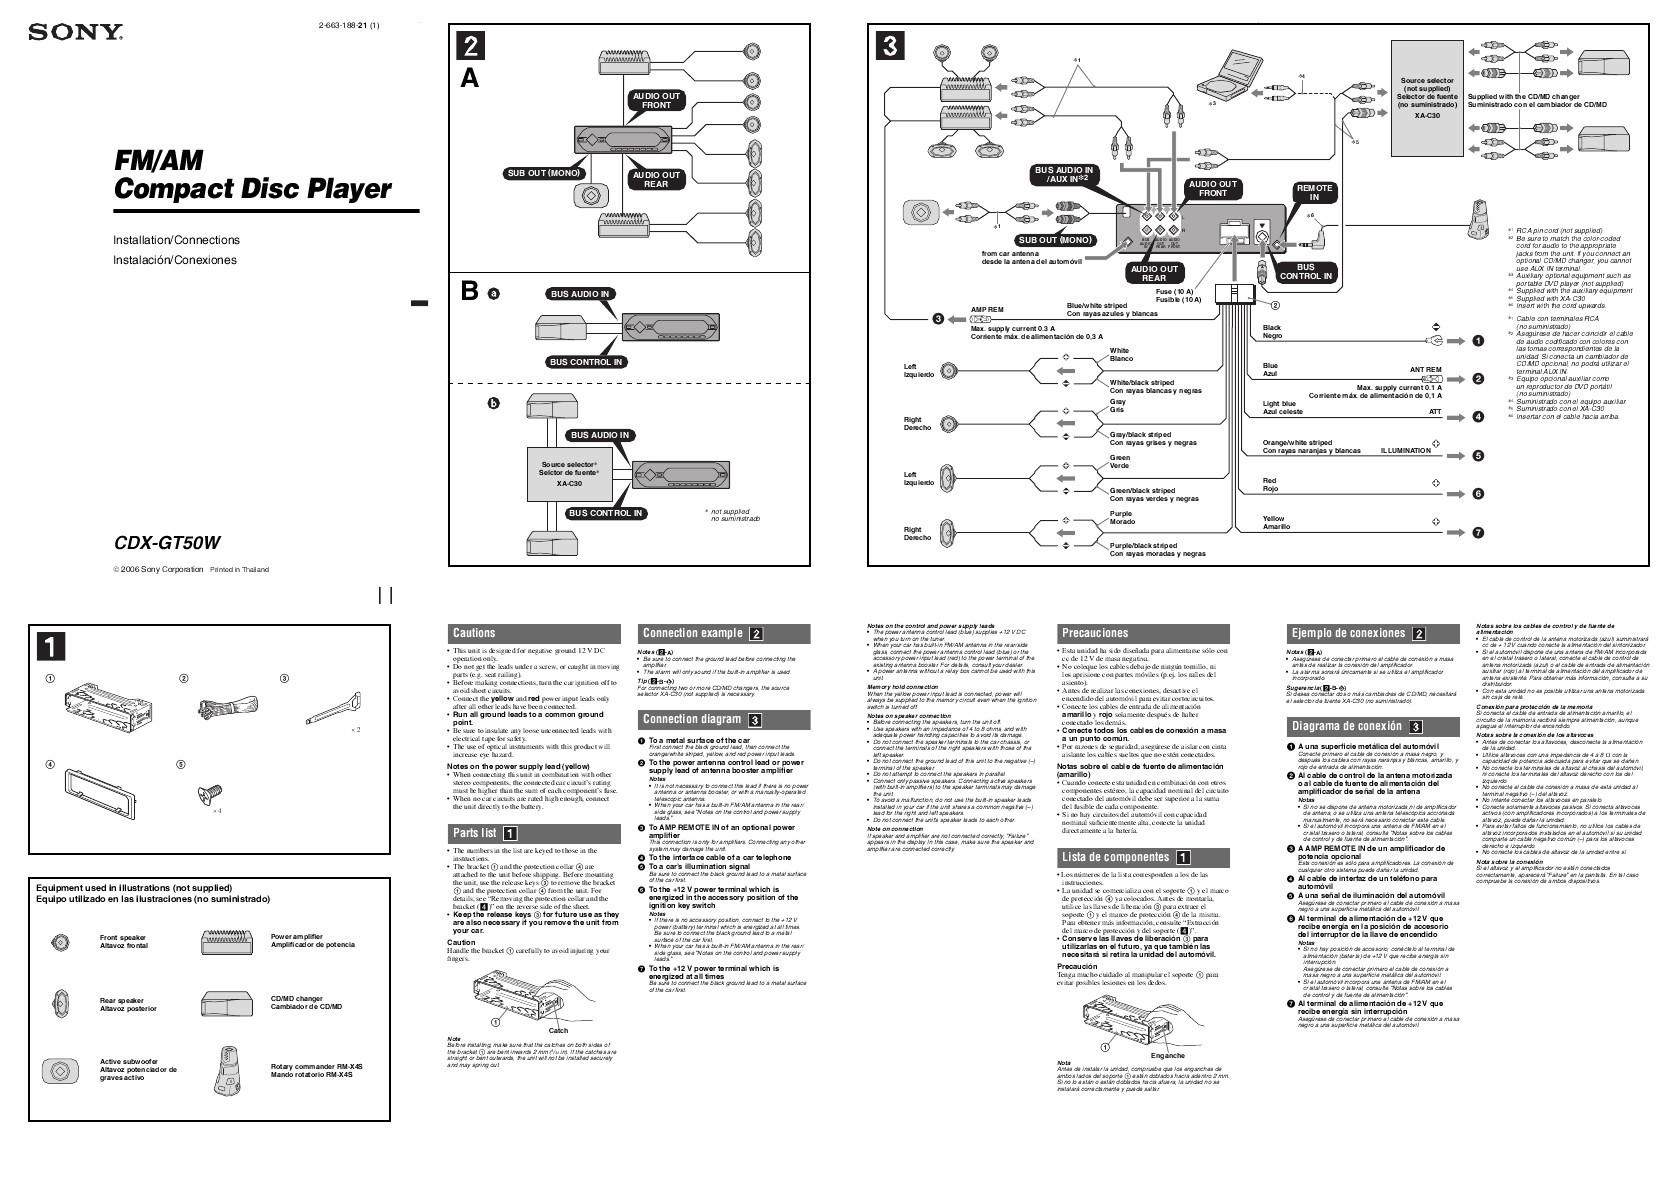 Sony Xplod Car Stereo Wiring Diagram Diagram sony Xplod